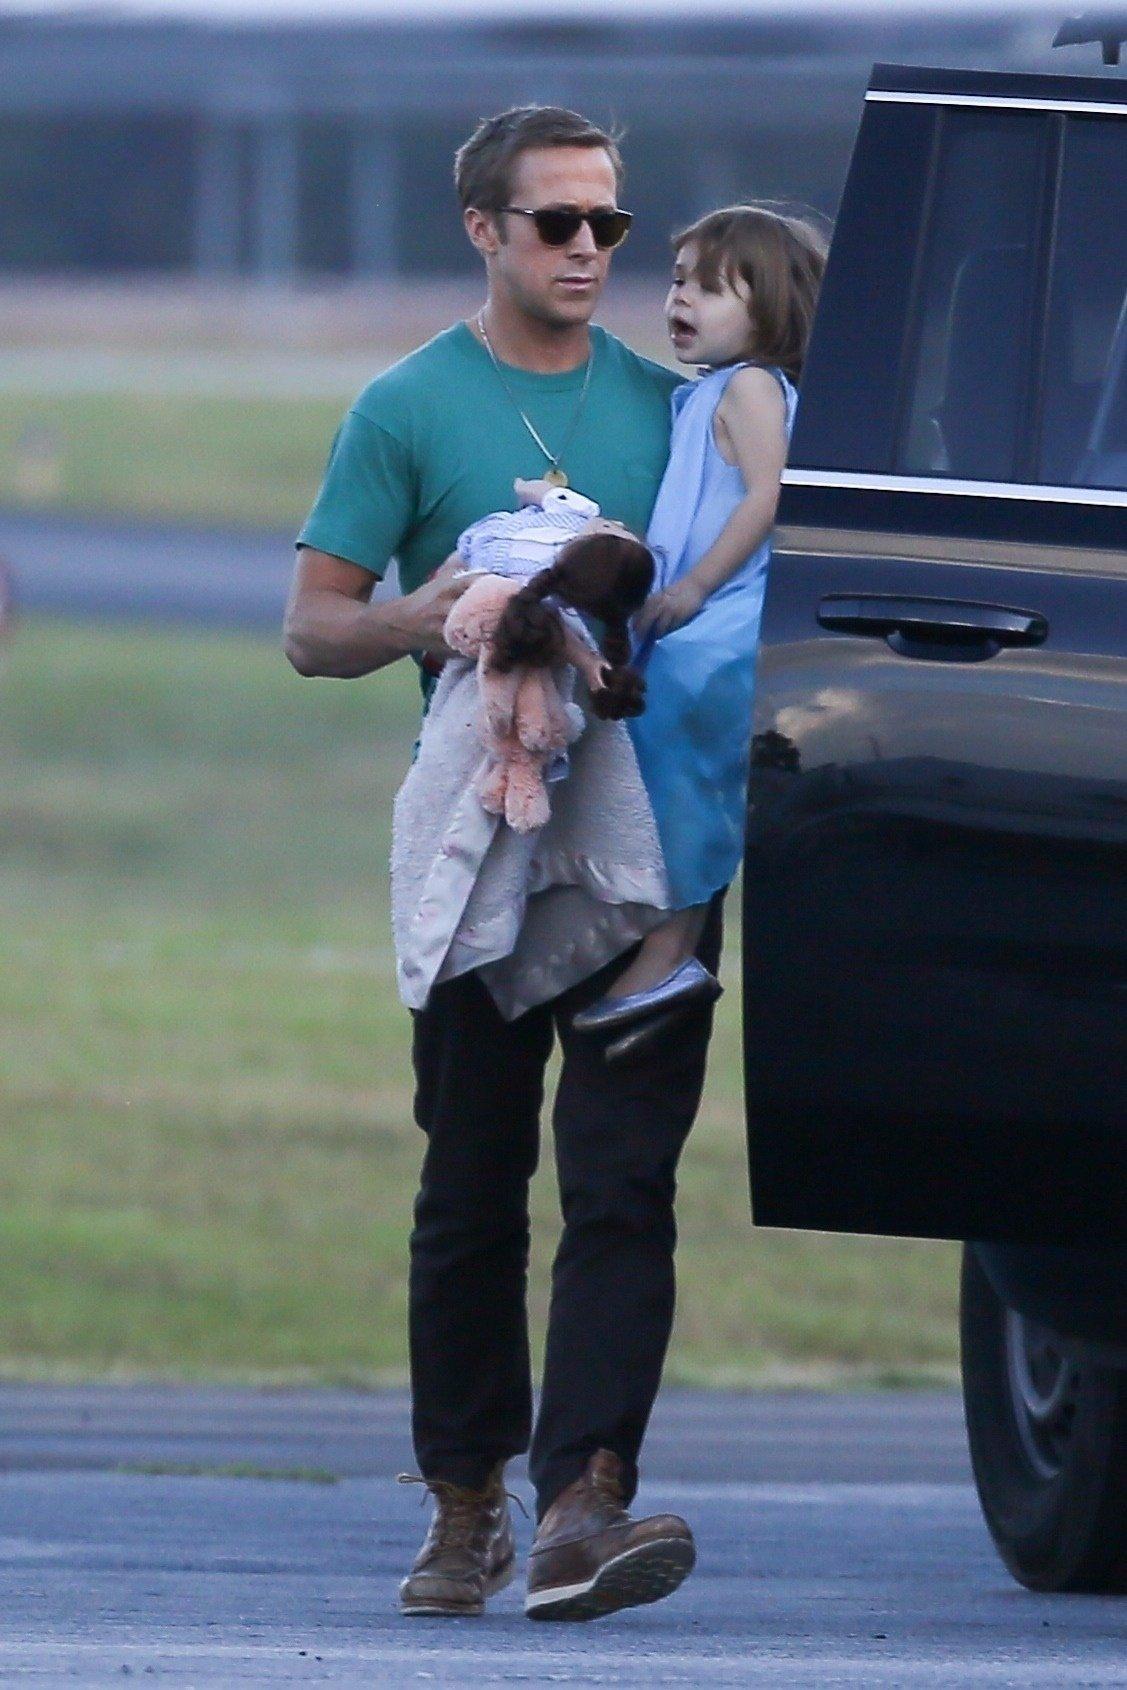 Glumački par Ryan Gosling i Eva Mendes s kćerima u Los Angelesu